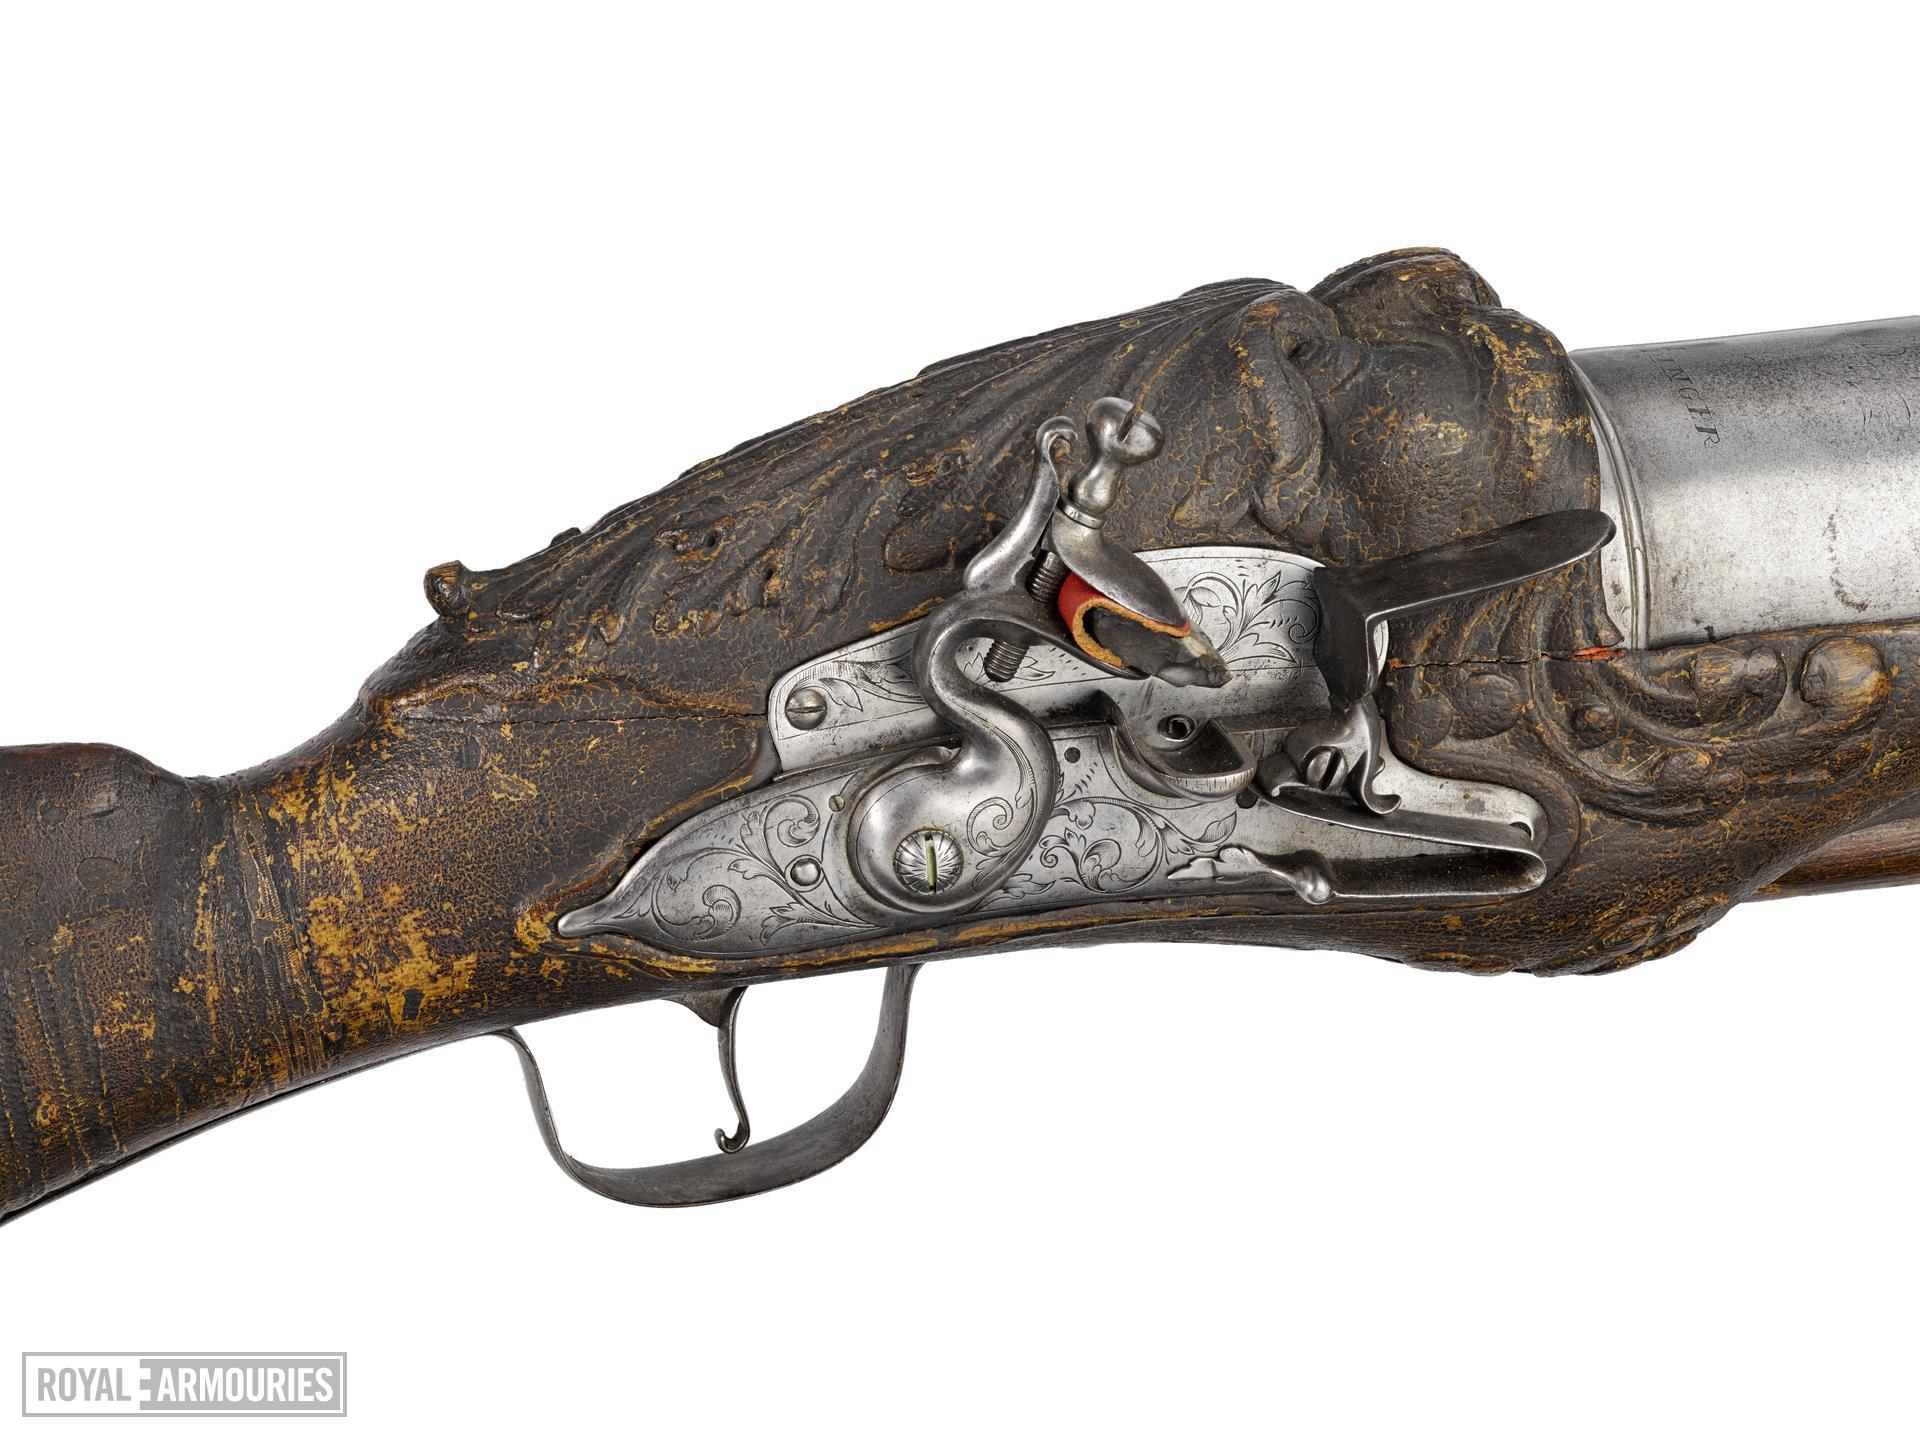 Flintlock firework gun - by James Ermendinger